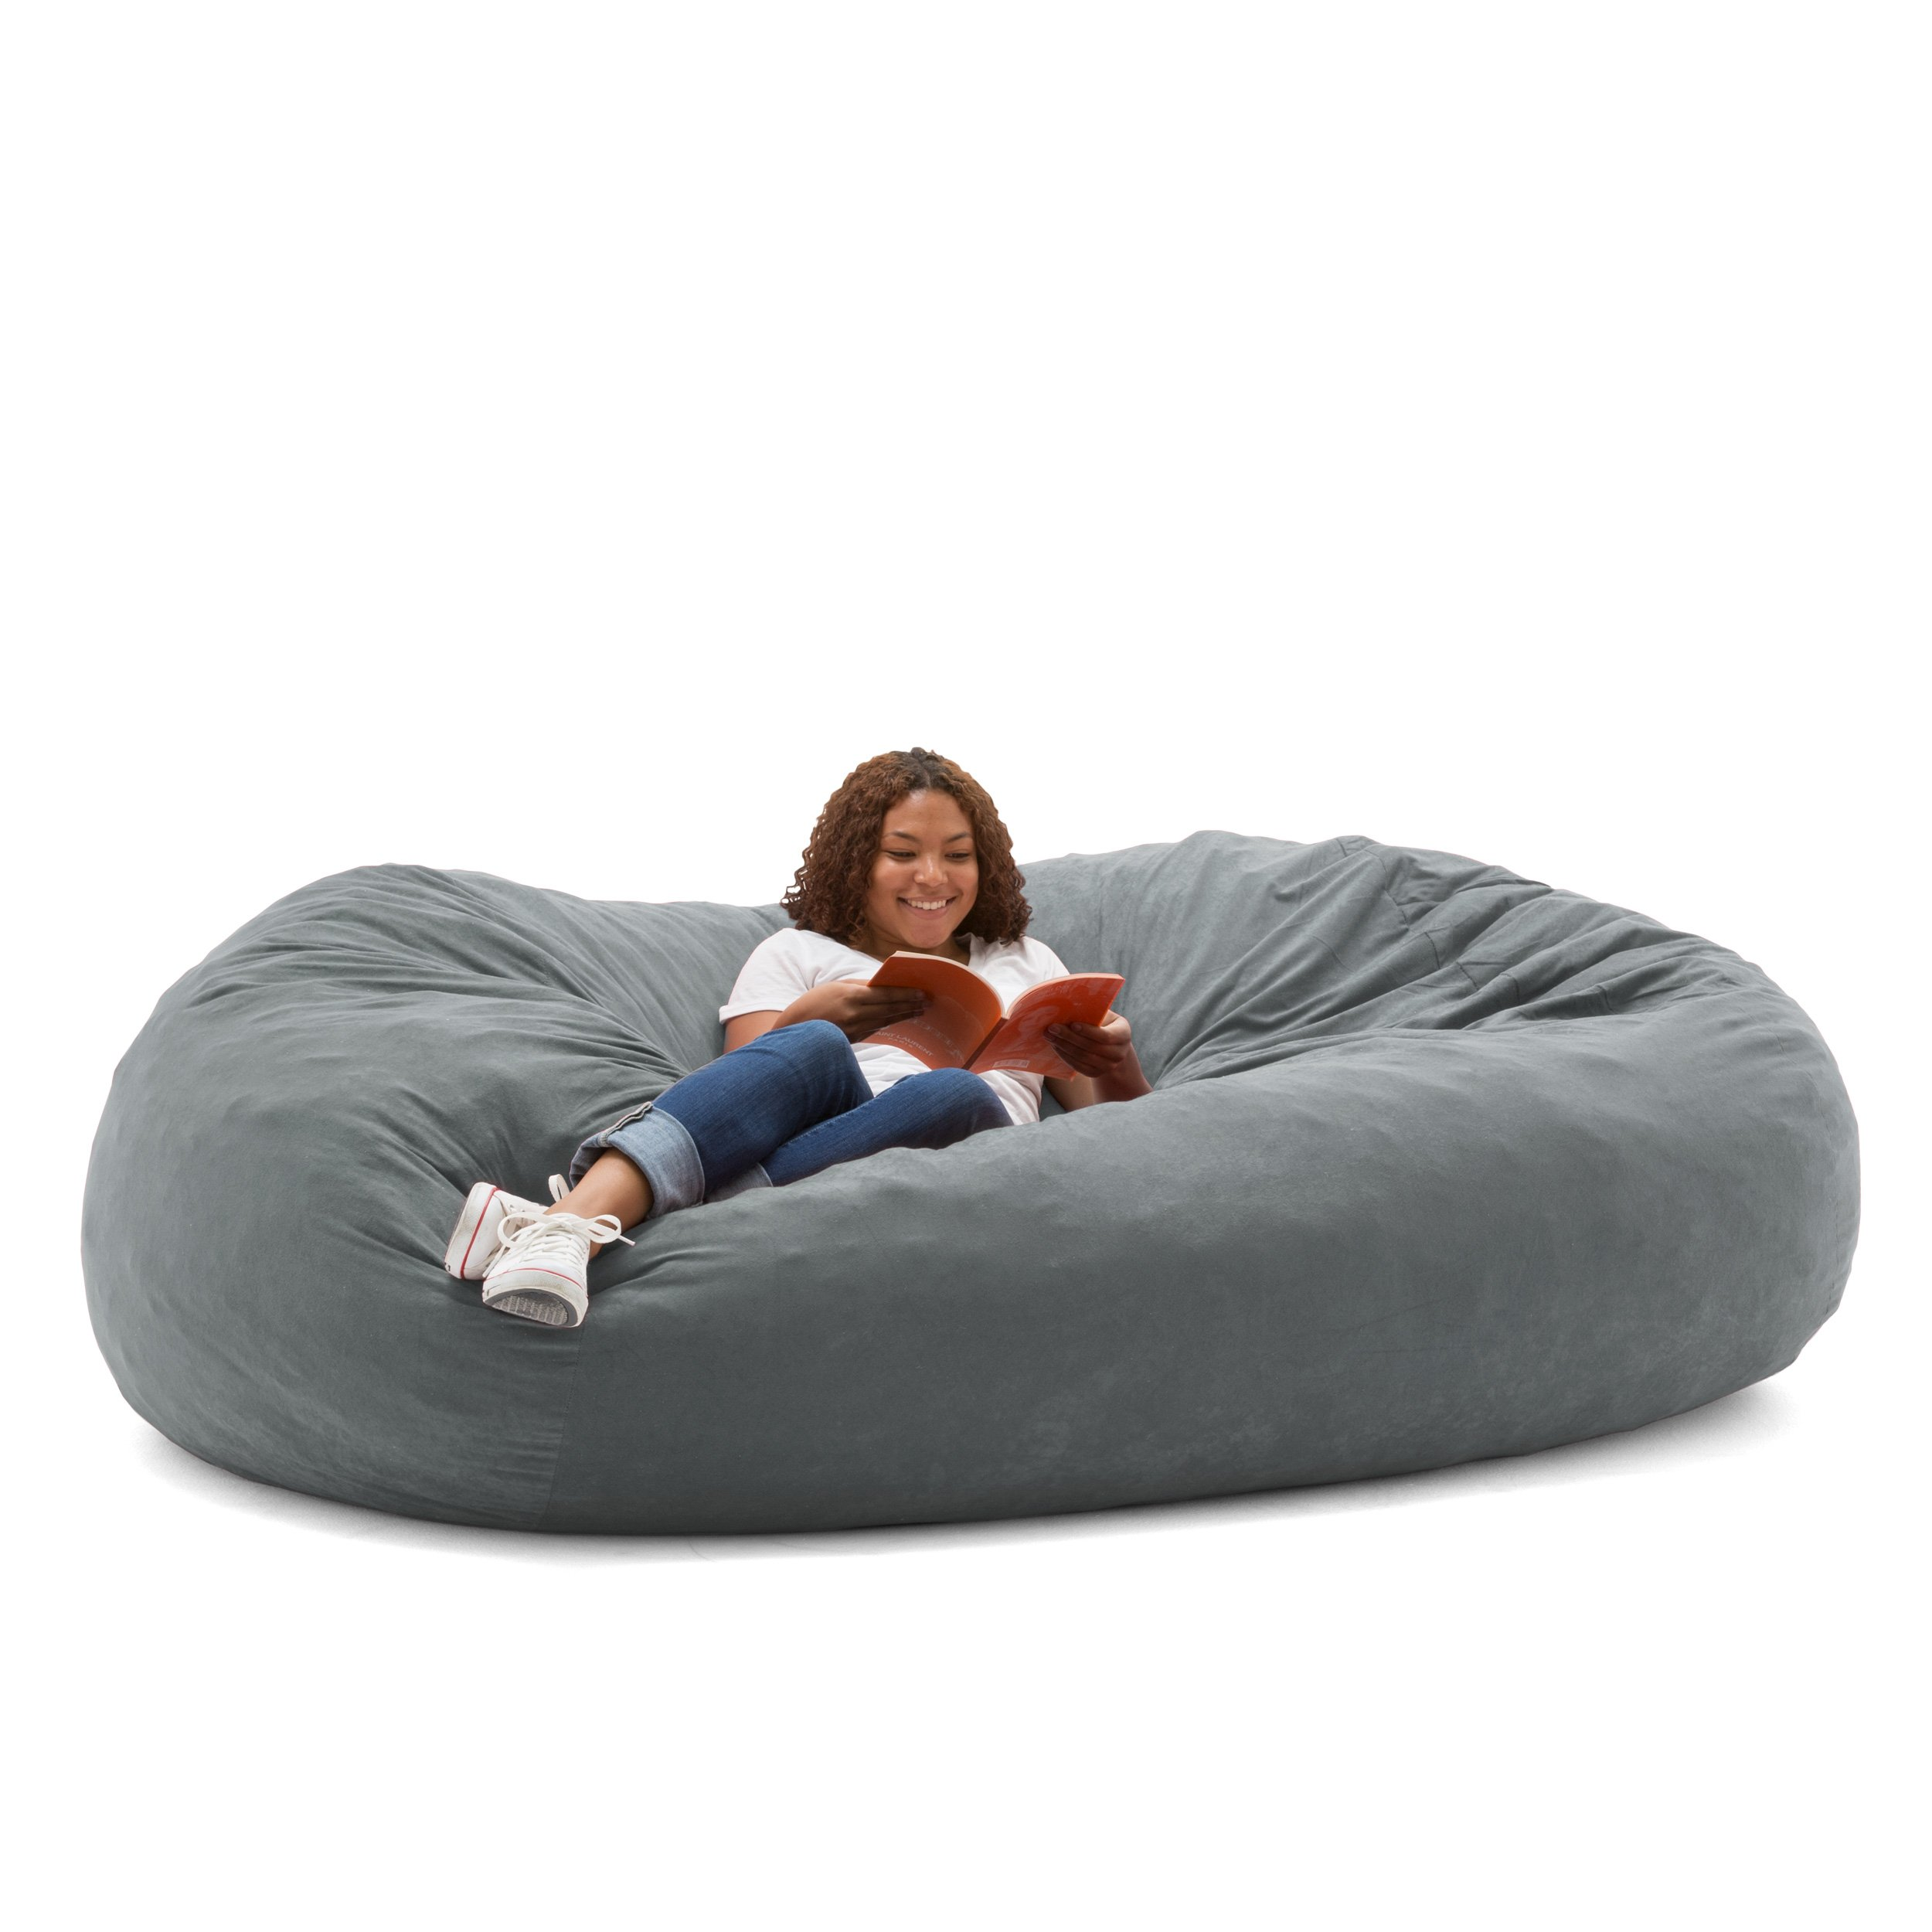 Big Joe XXL Fuf Foam Filled Bean Bag Chair, Comfort Suede, Steel Grey by Big Joe